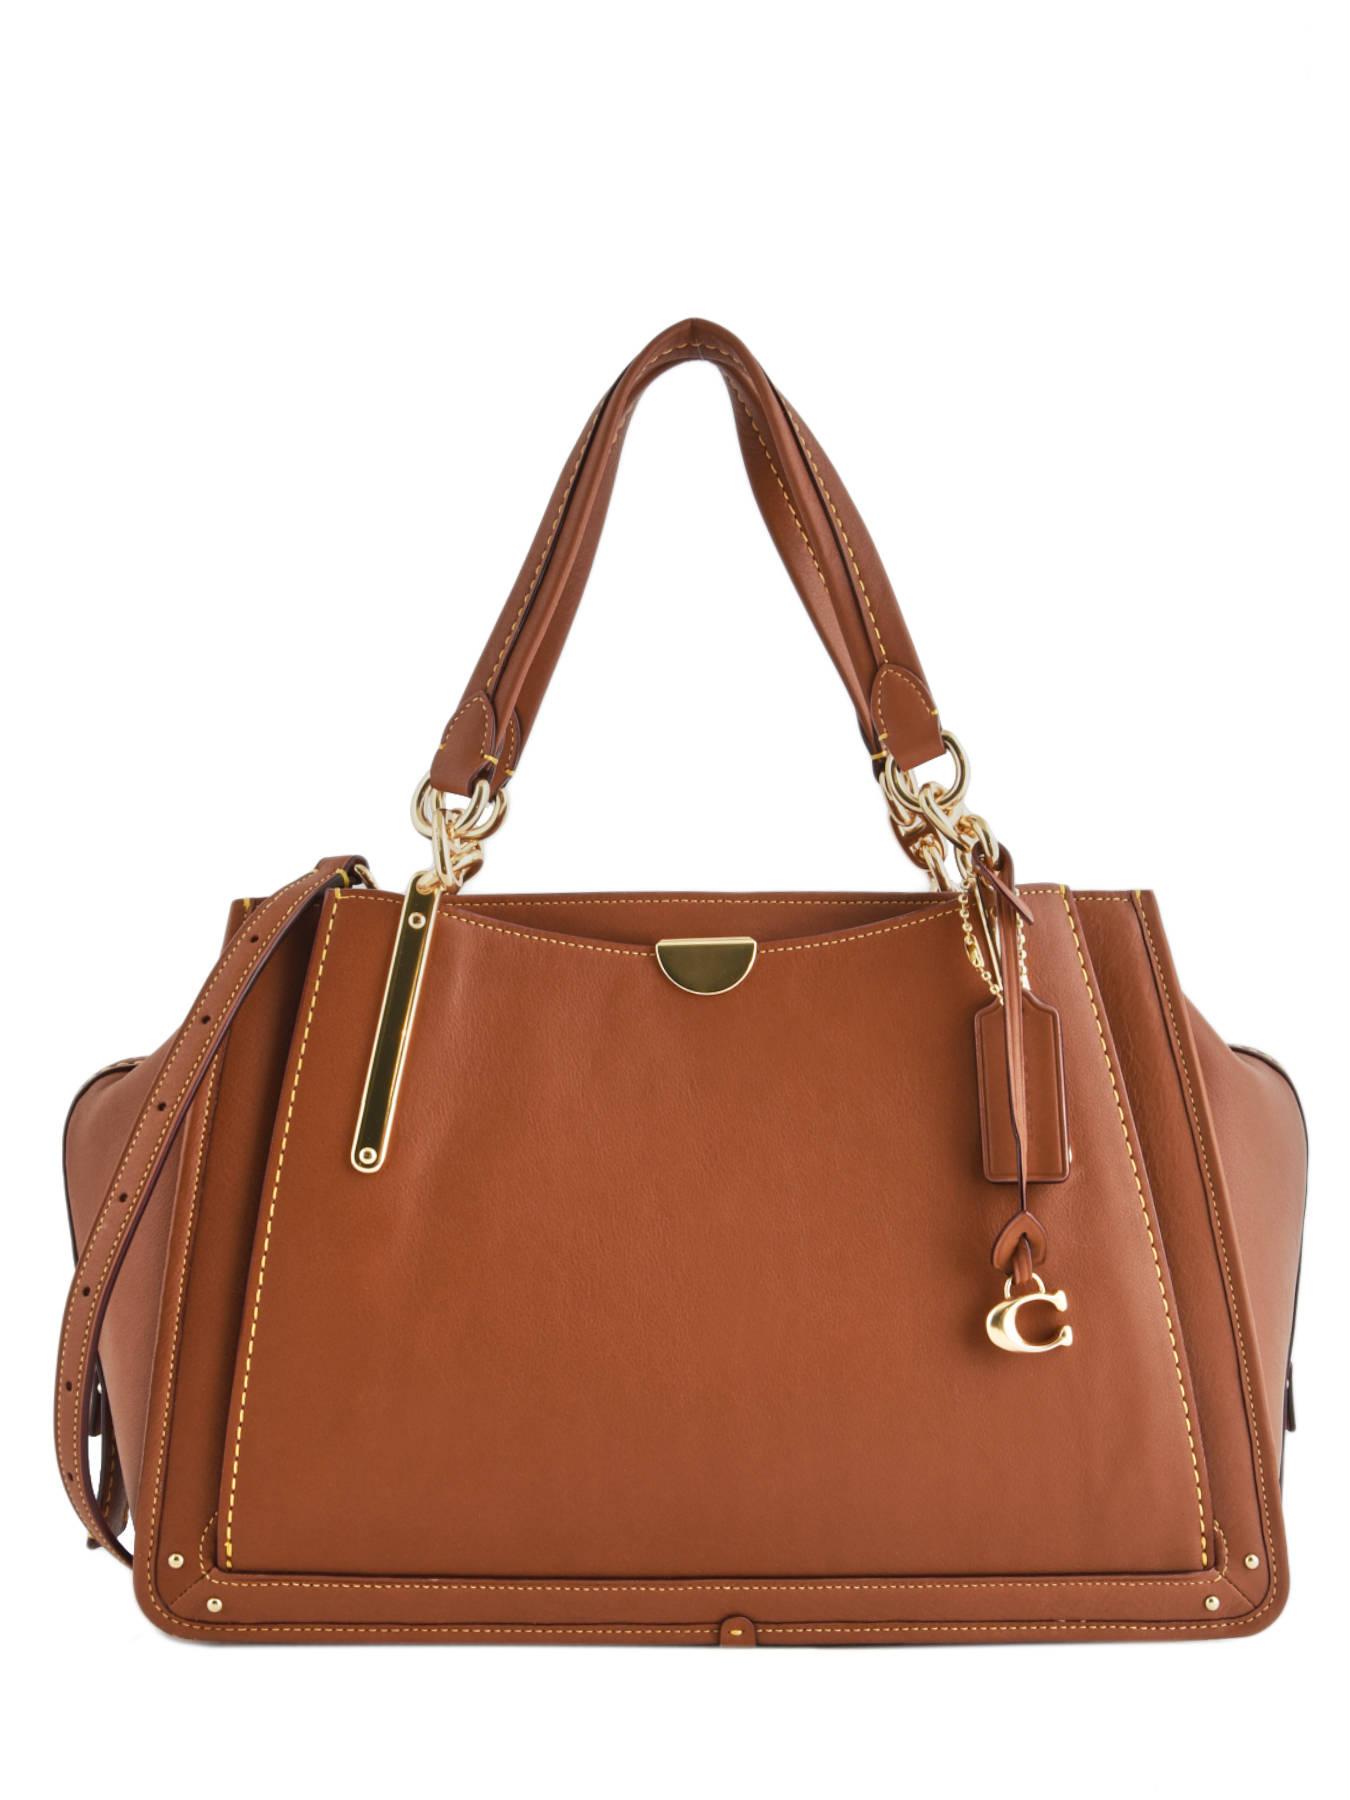 ... Tote Bag Dreamer 36 Leather Coach Brown dreamer 31640 ... 5ca27b6f51e66